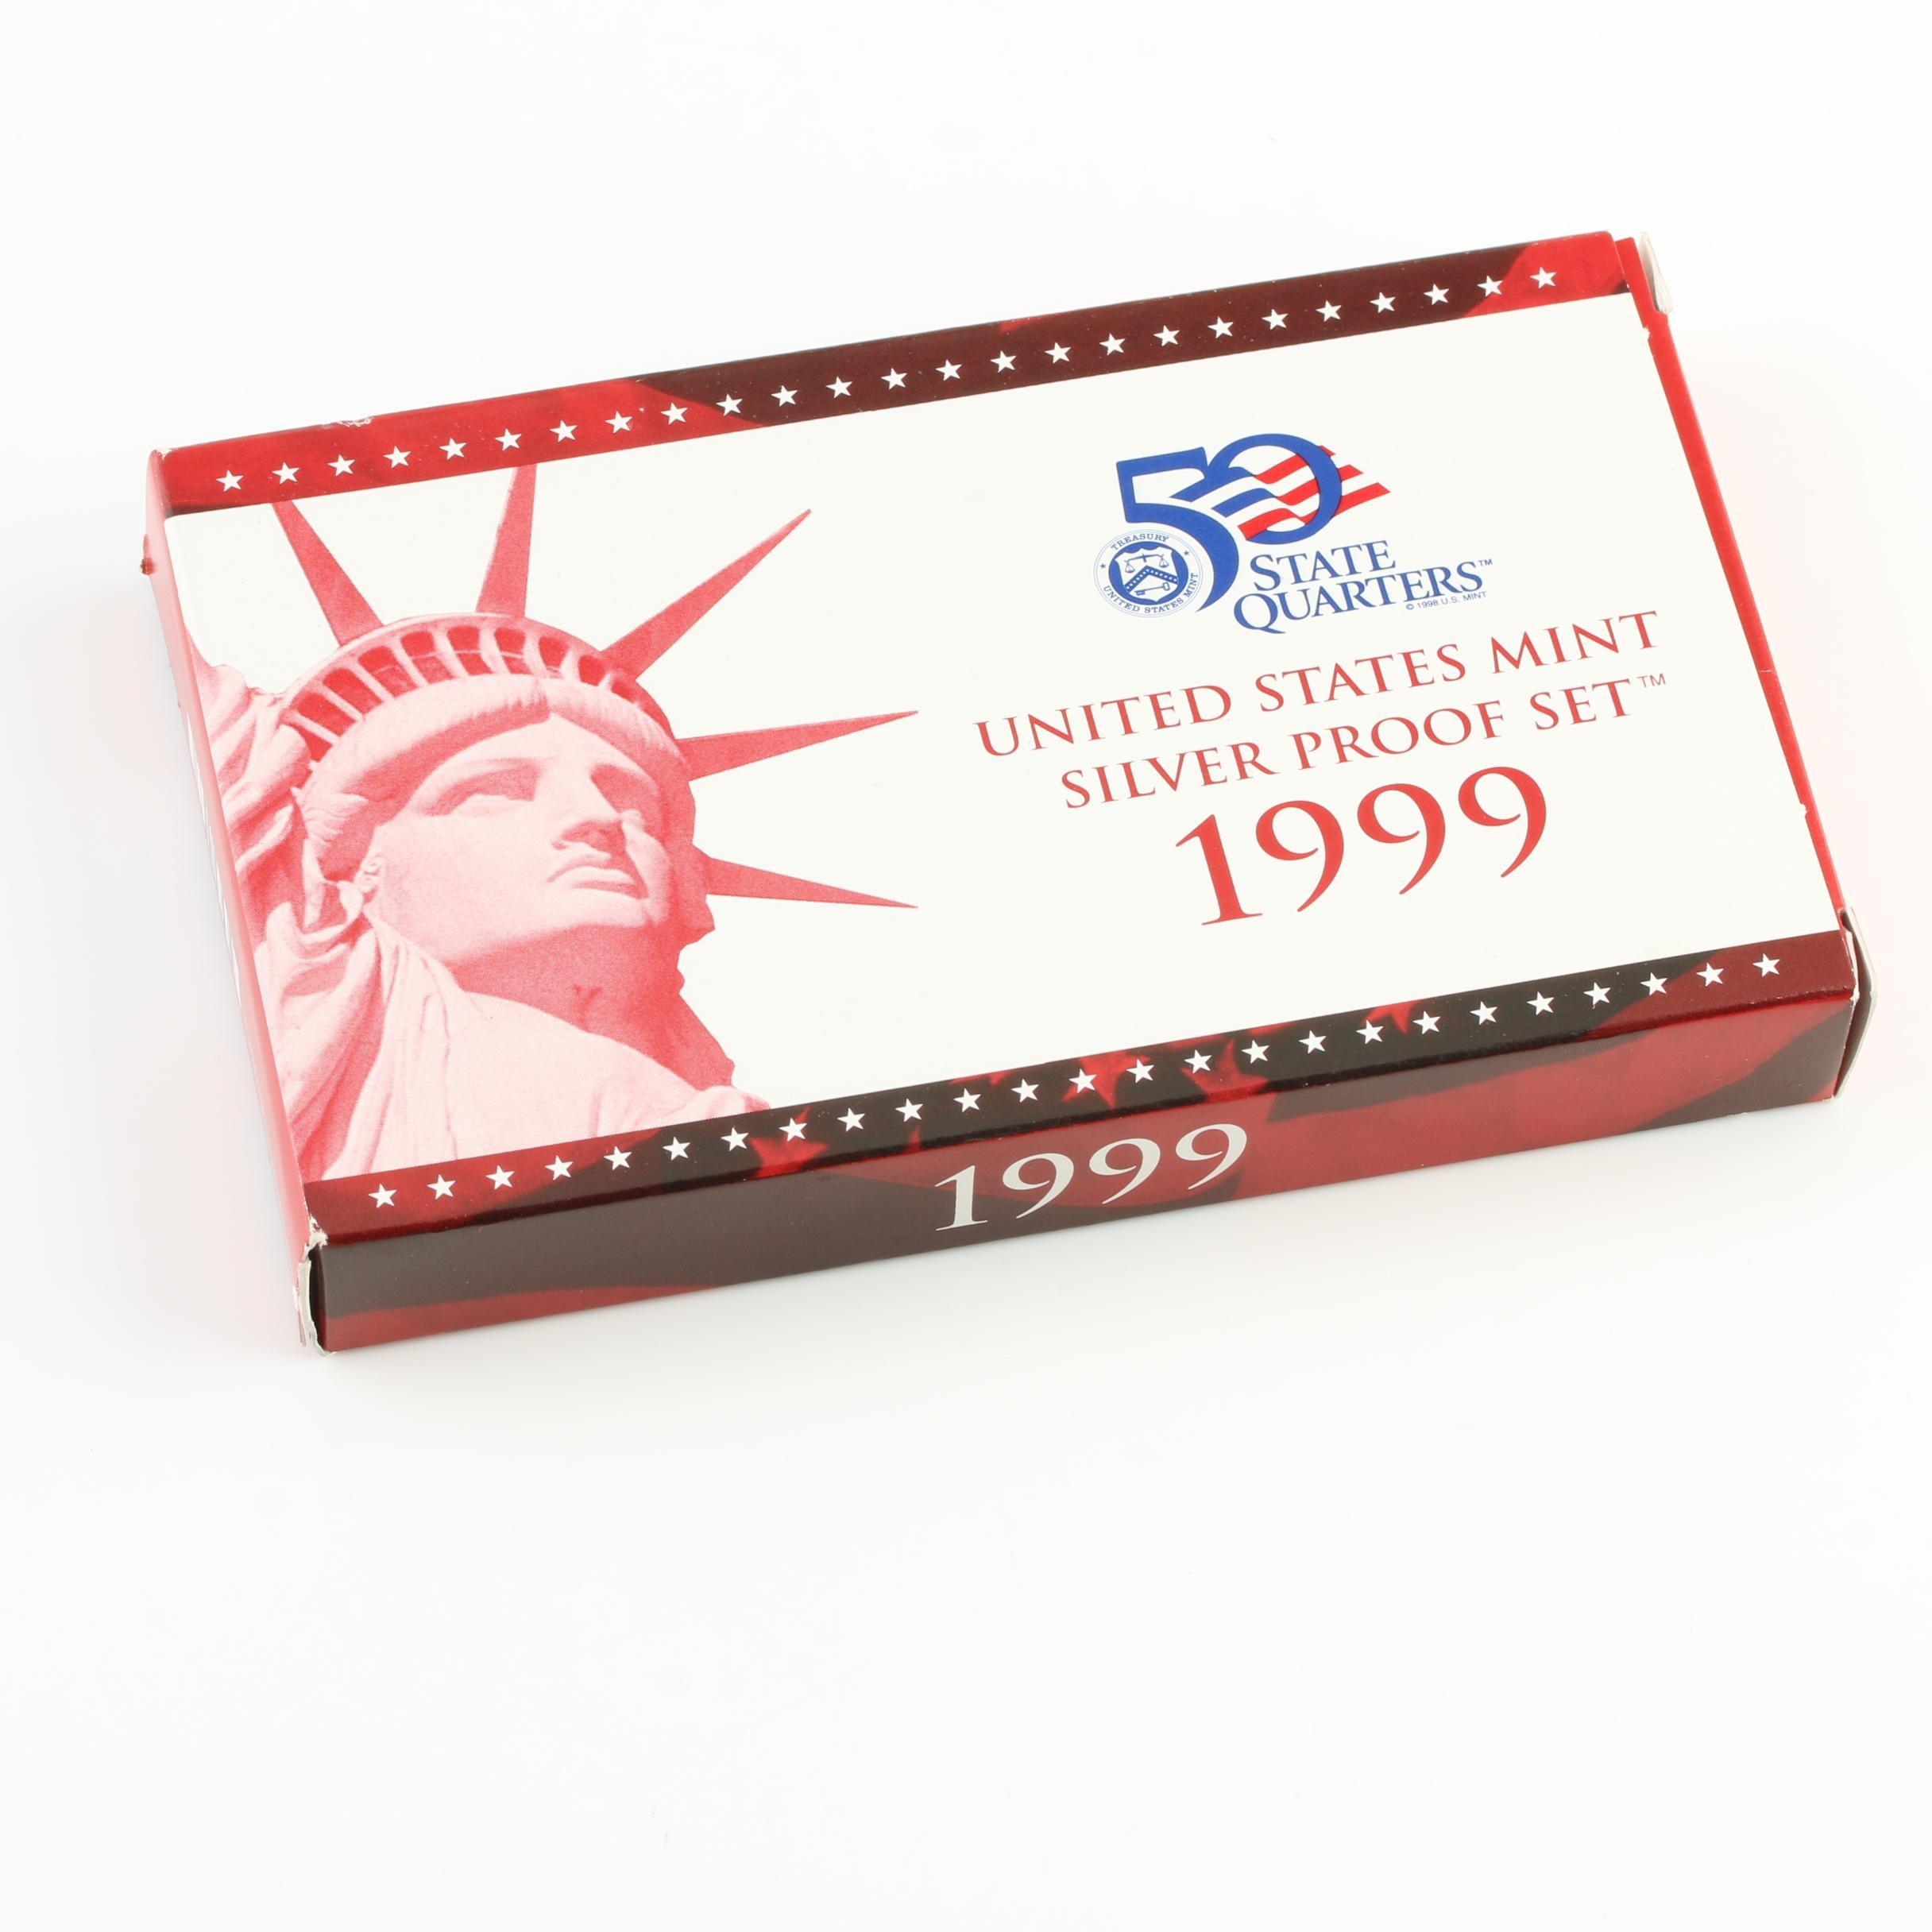 1999 U.S. Mint Silver Proof Set